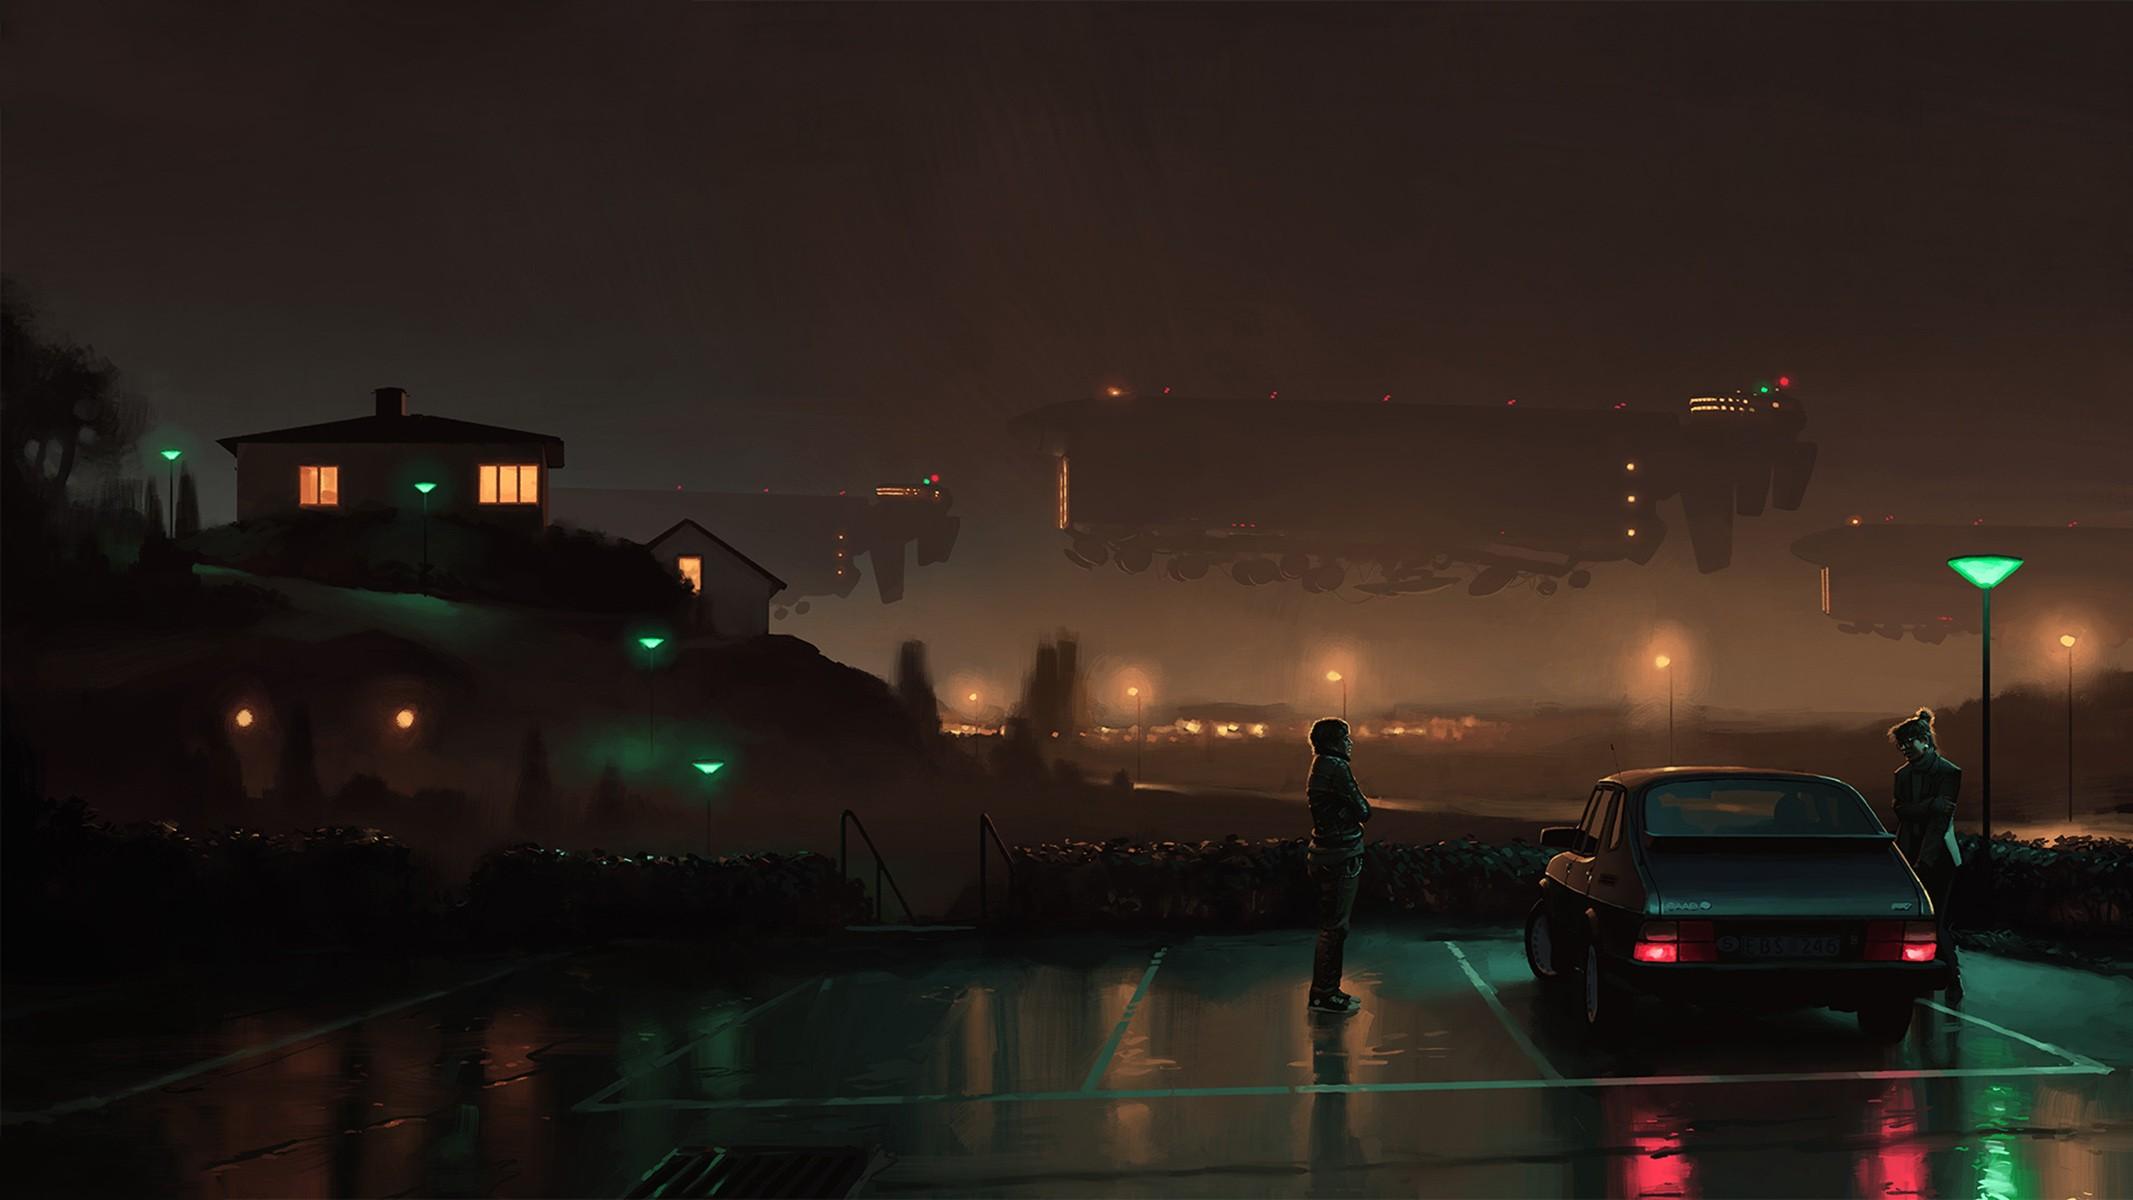 2133x1200 px artwork car cyberpunk futuristic house night saab saab 900 science fiction simon stalenhag spaceship